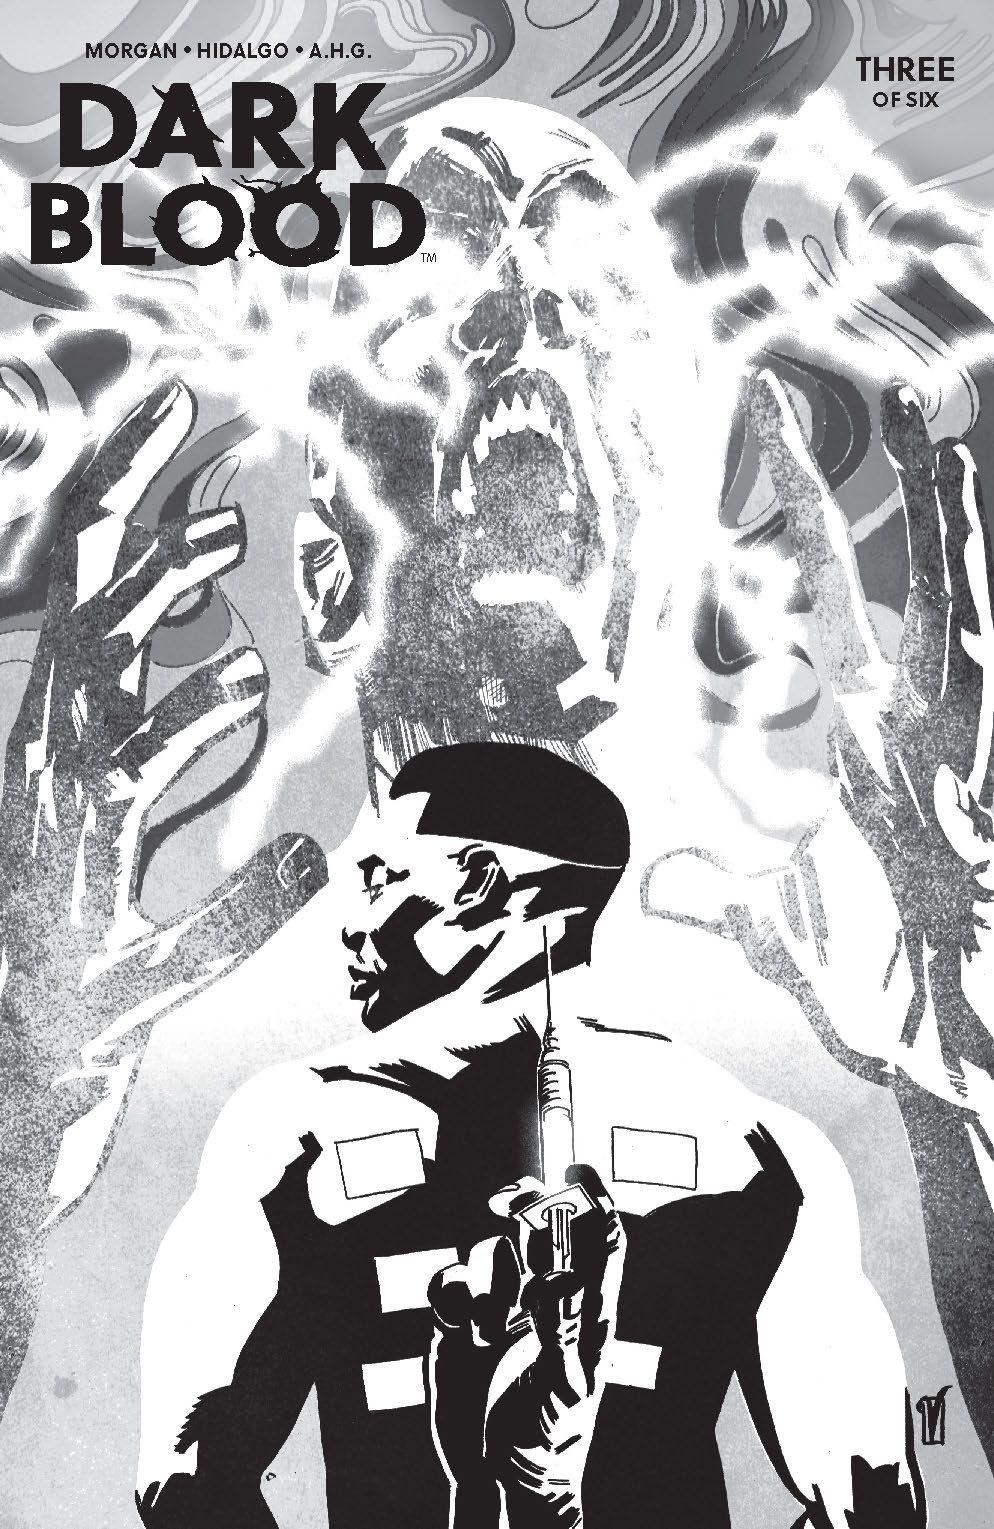 DarkBlood_003_Cover_C_Variant ComicList Previews: DARK BLOOD #3 (OF 6)